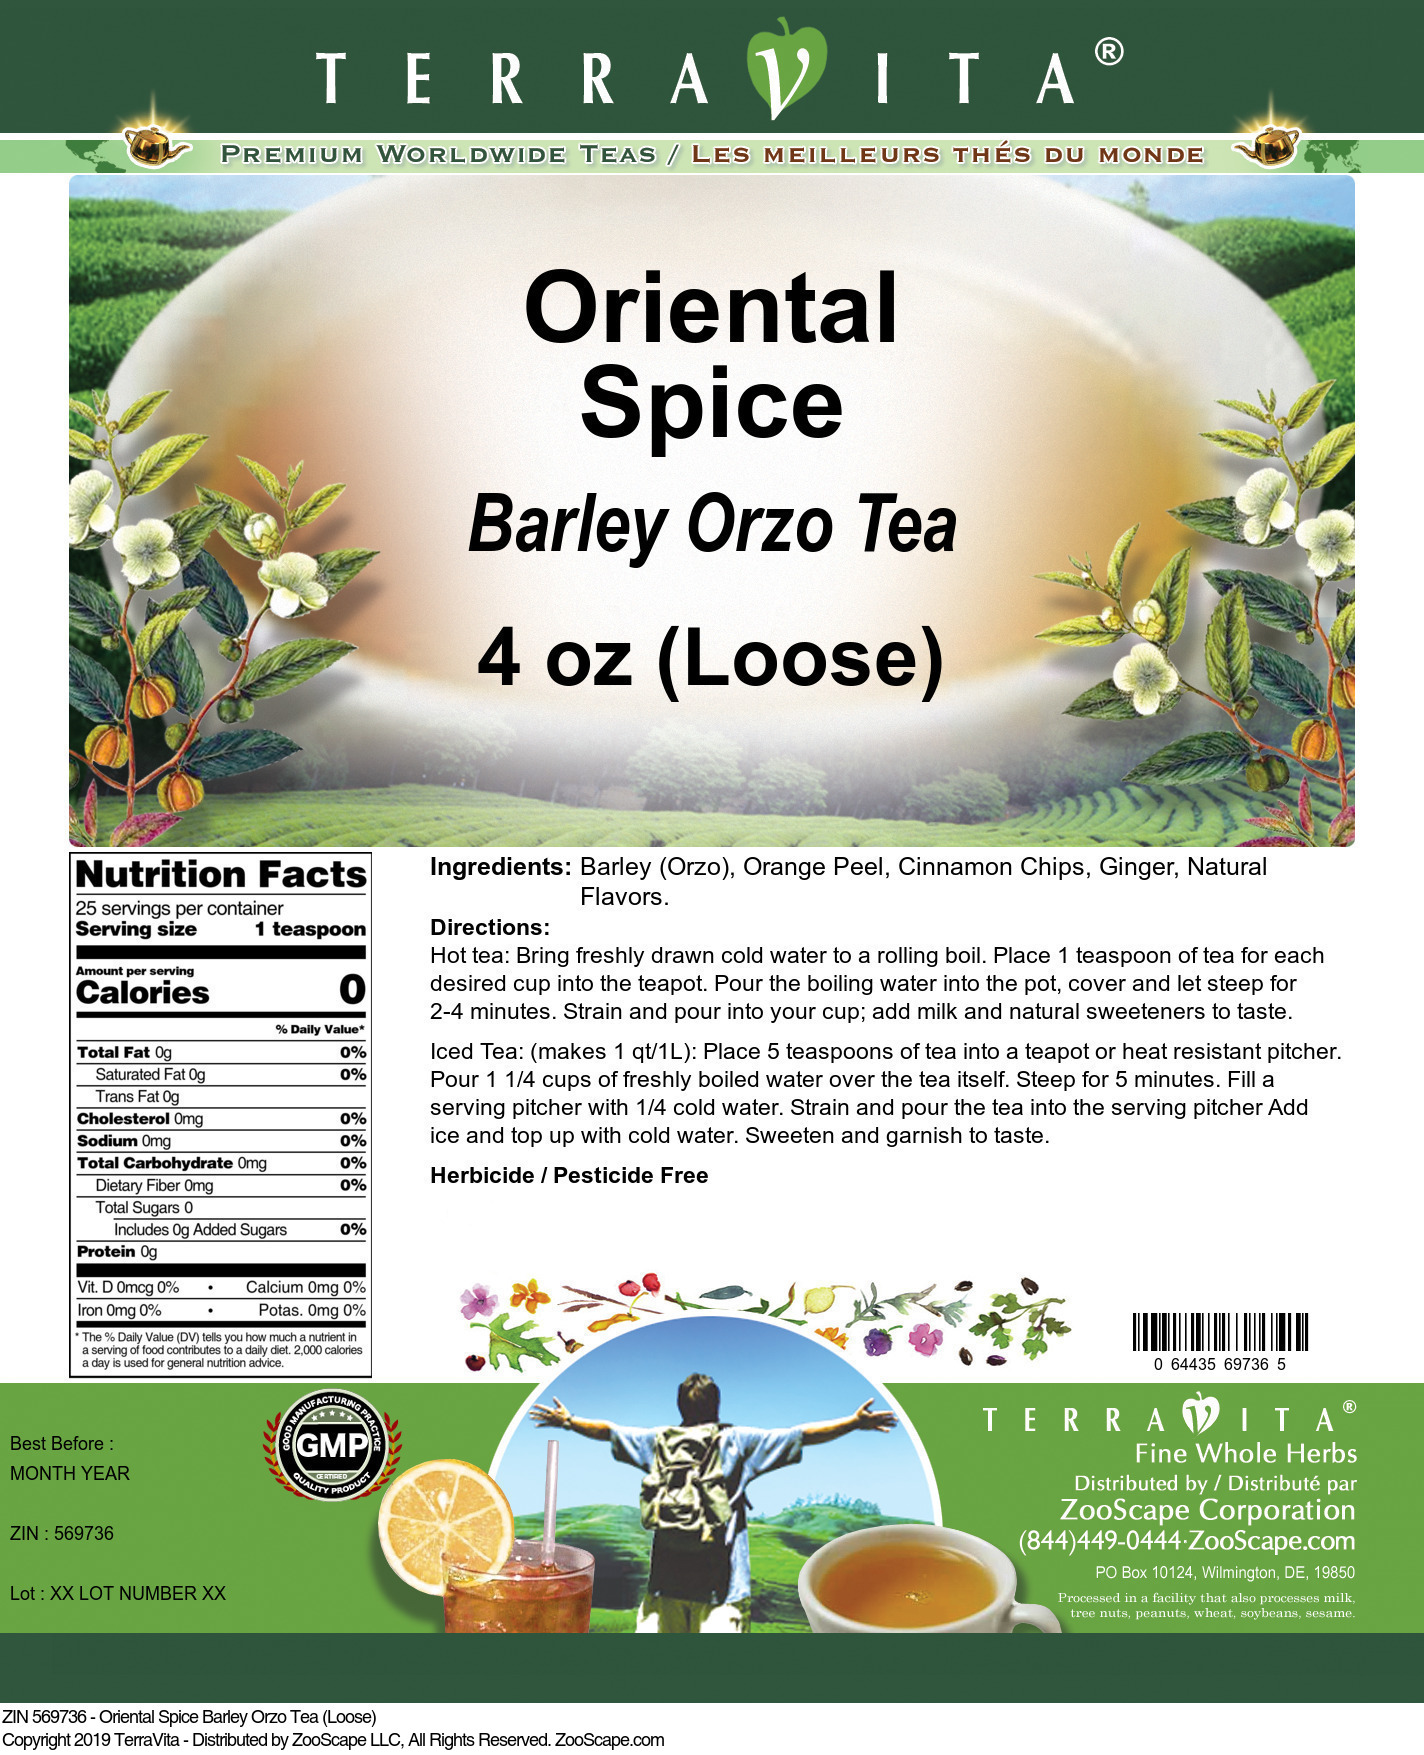 Oriental Spice Barley Orzo Tea (Loose)